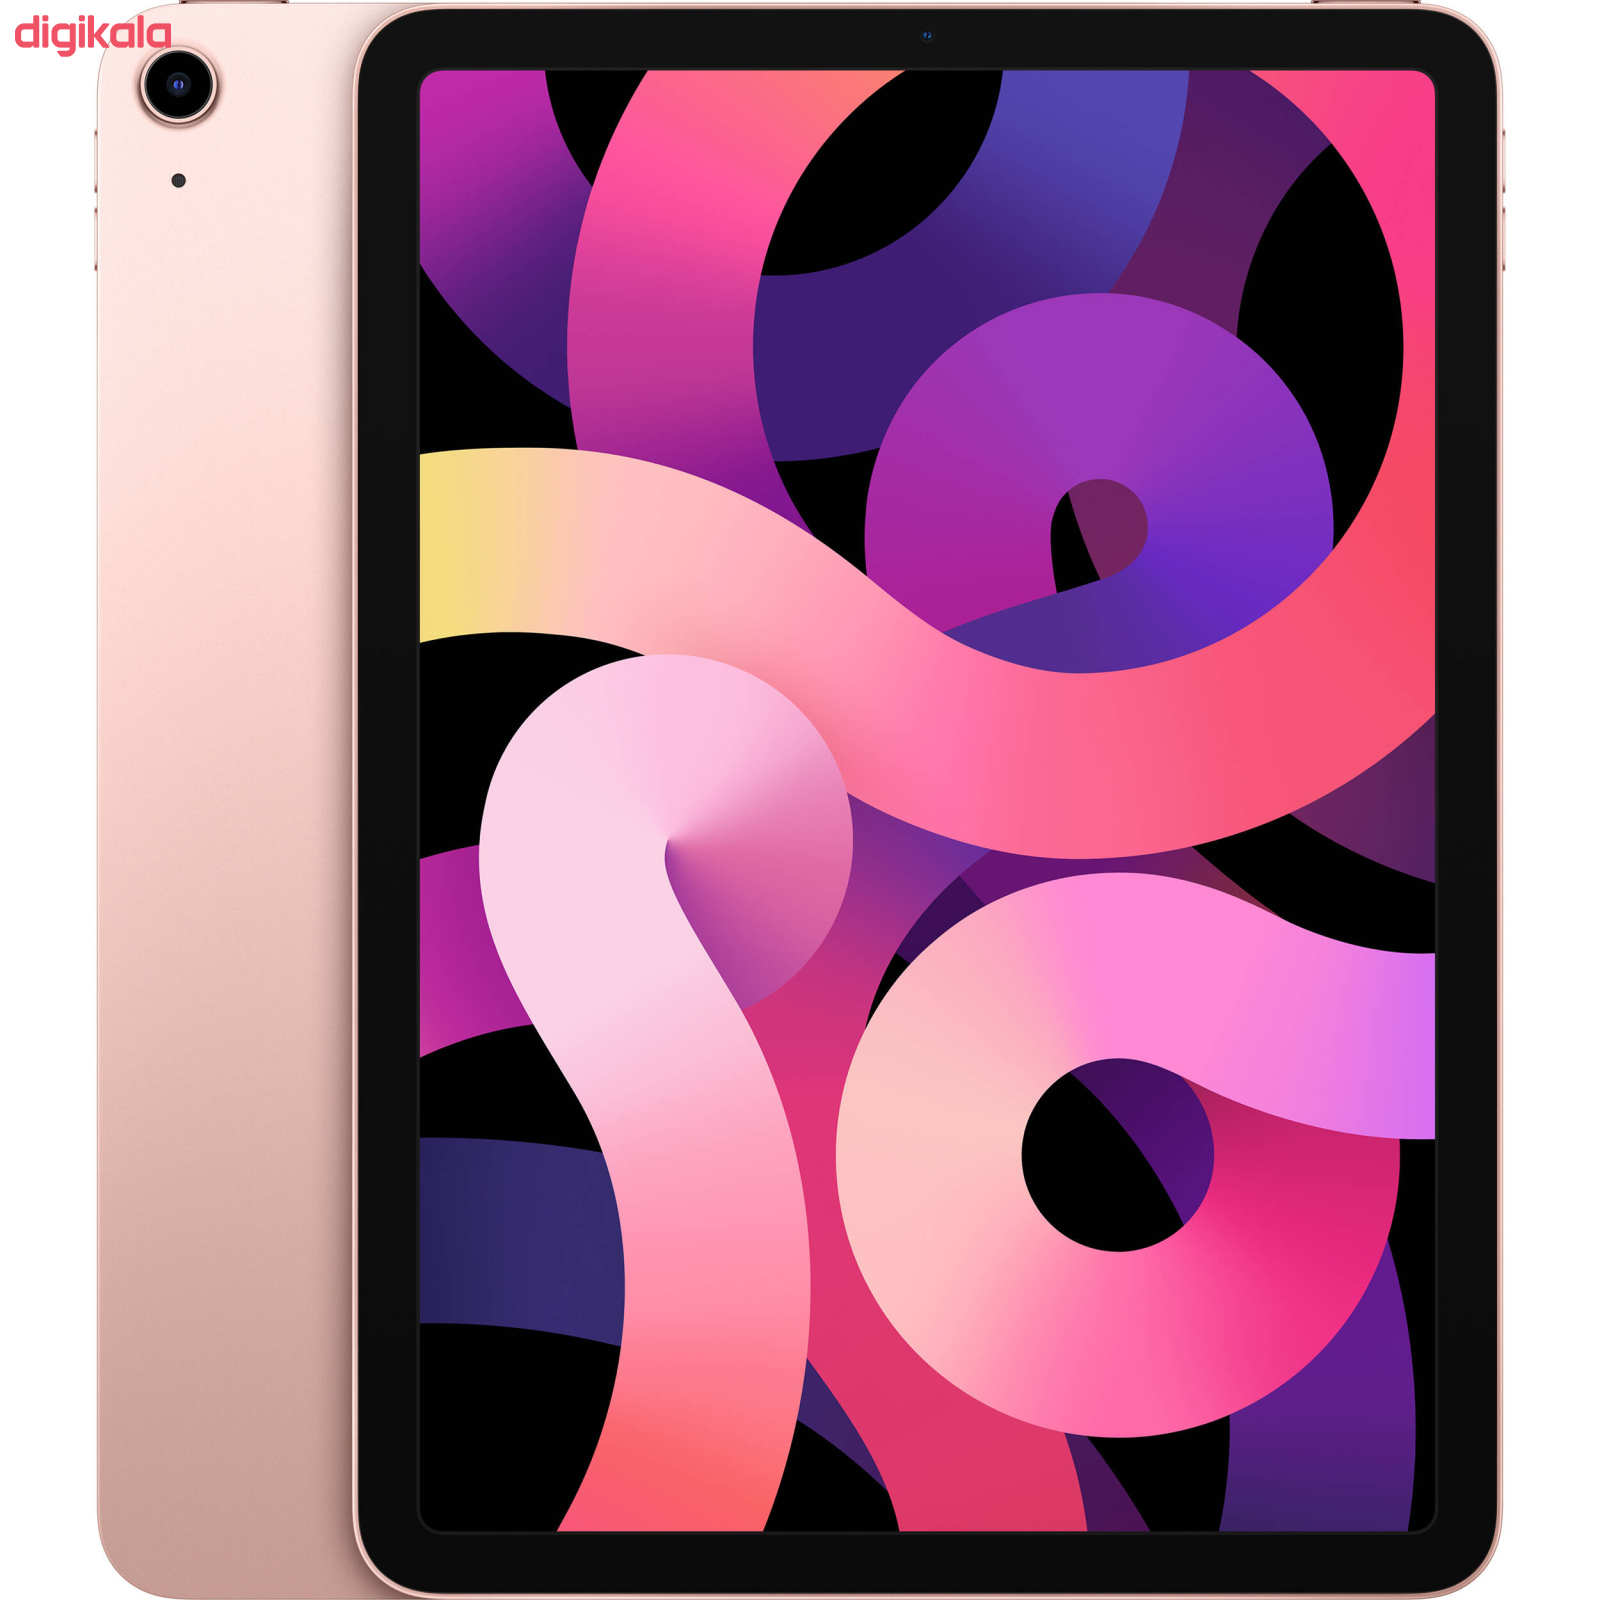 تبلت اپل مدل iPad Air 10.9 inch 2020 WiFi ظرفیت 256 گیگابایت  main 1 10